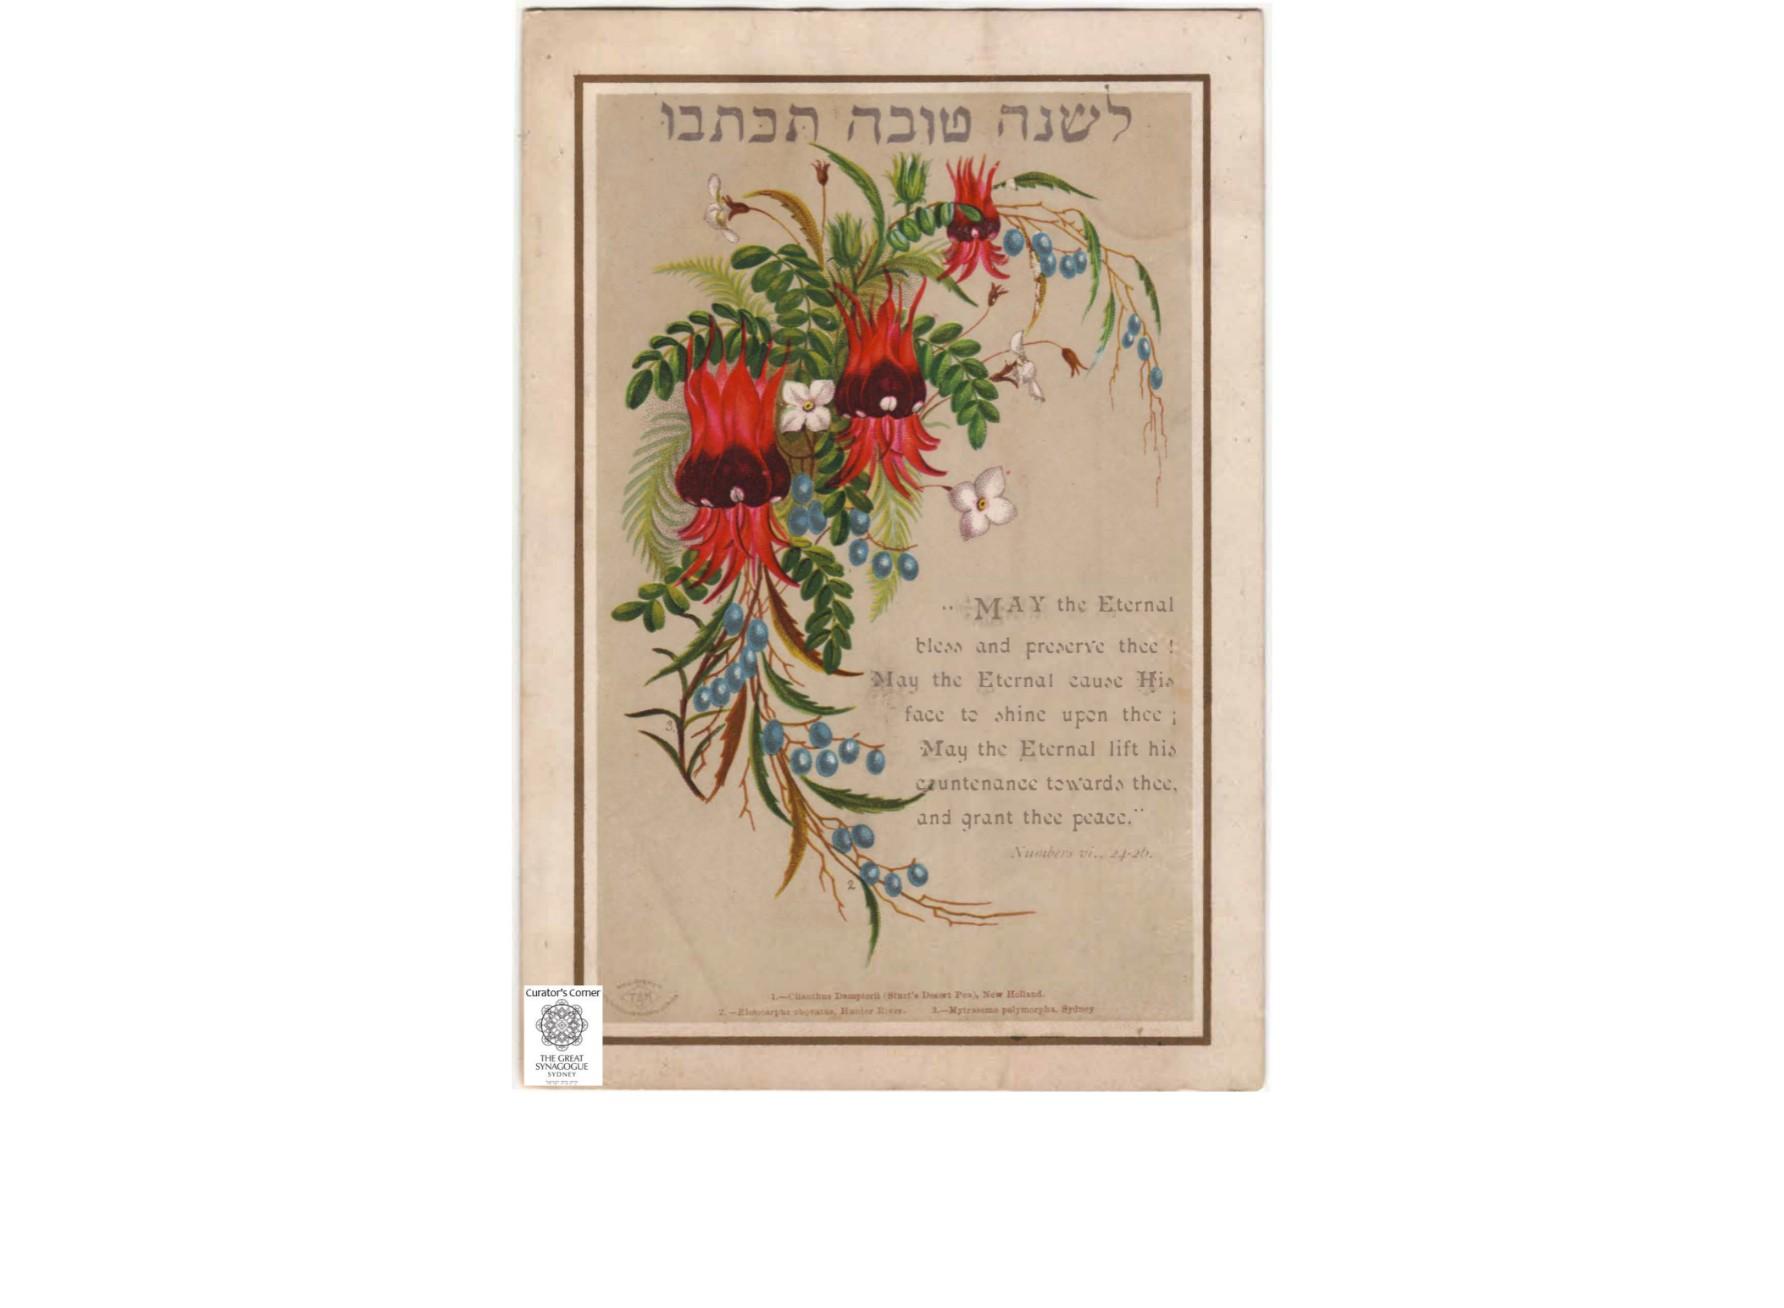 "<span class=""slider_description"">3 of 3. A beautiful Jewish Australiana Happy New Year wish.</span>"